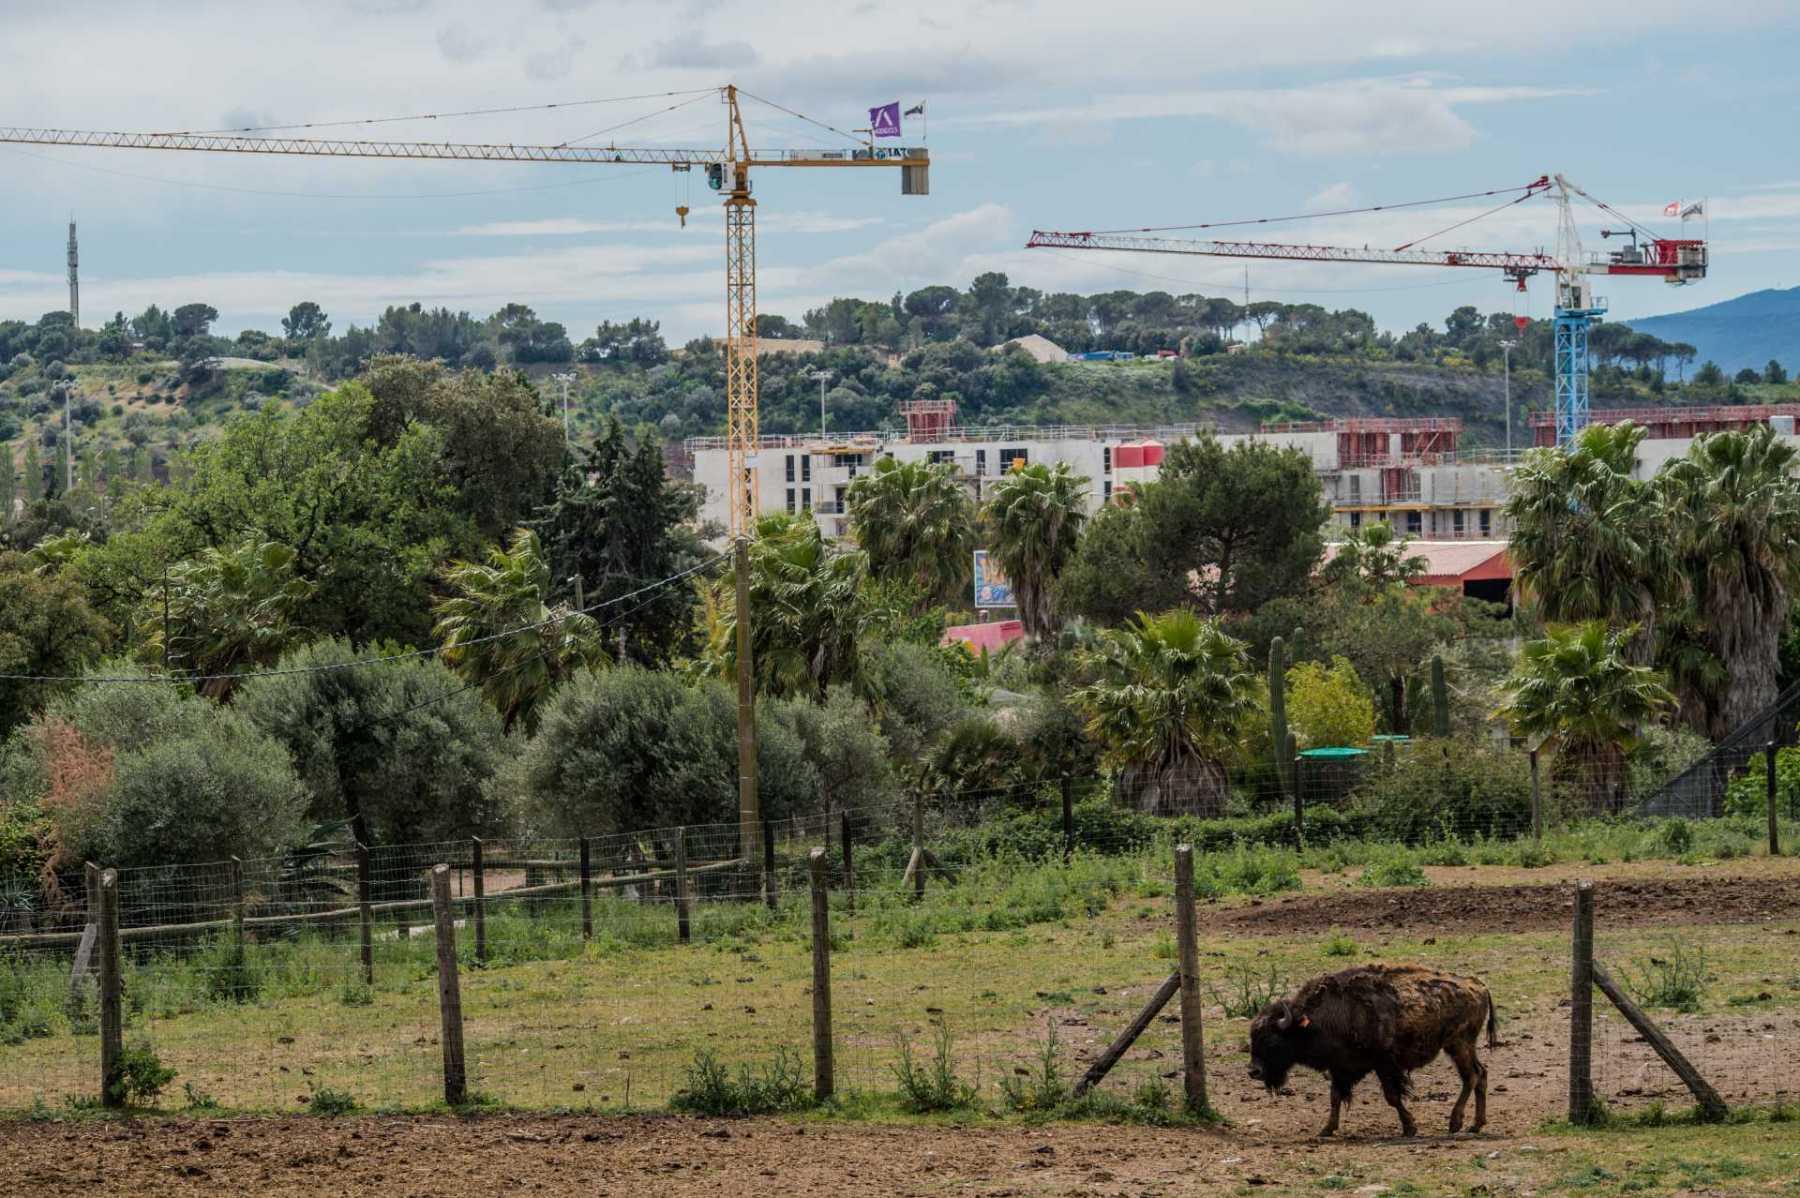 Plains buffalo. France, 2016. JMcArthur / Born Free Foundation